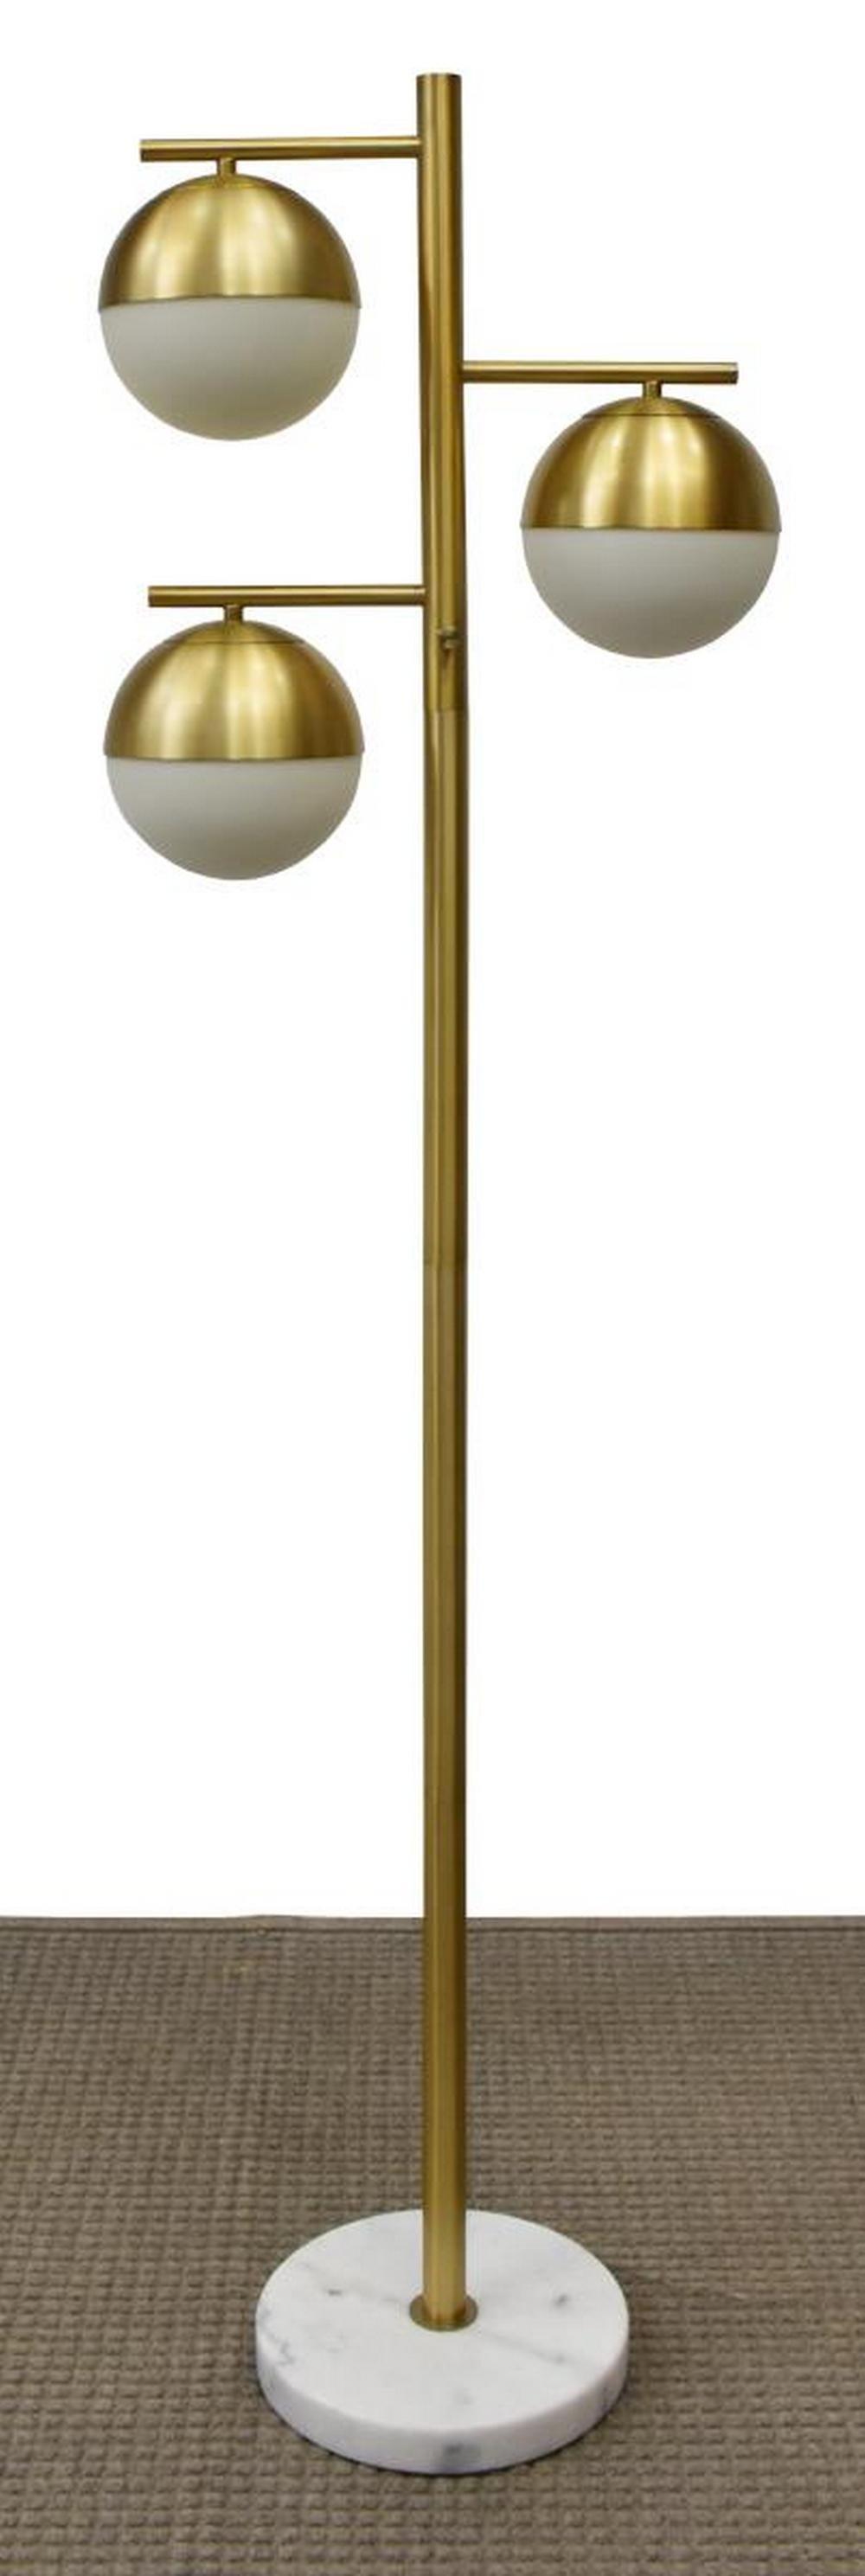 Early Carnival Strongman Hammer Mallet